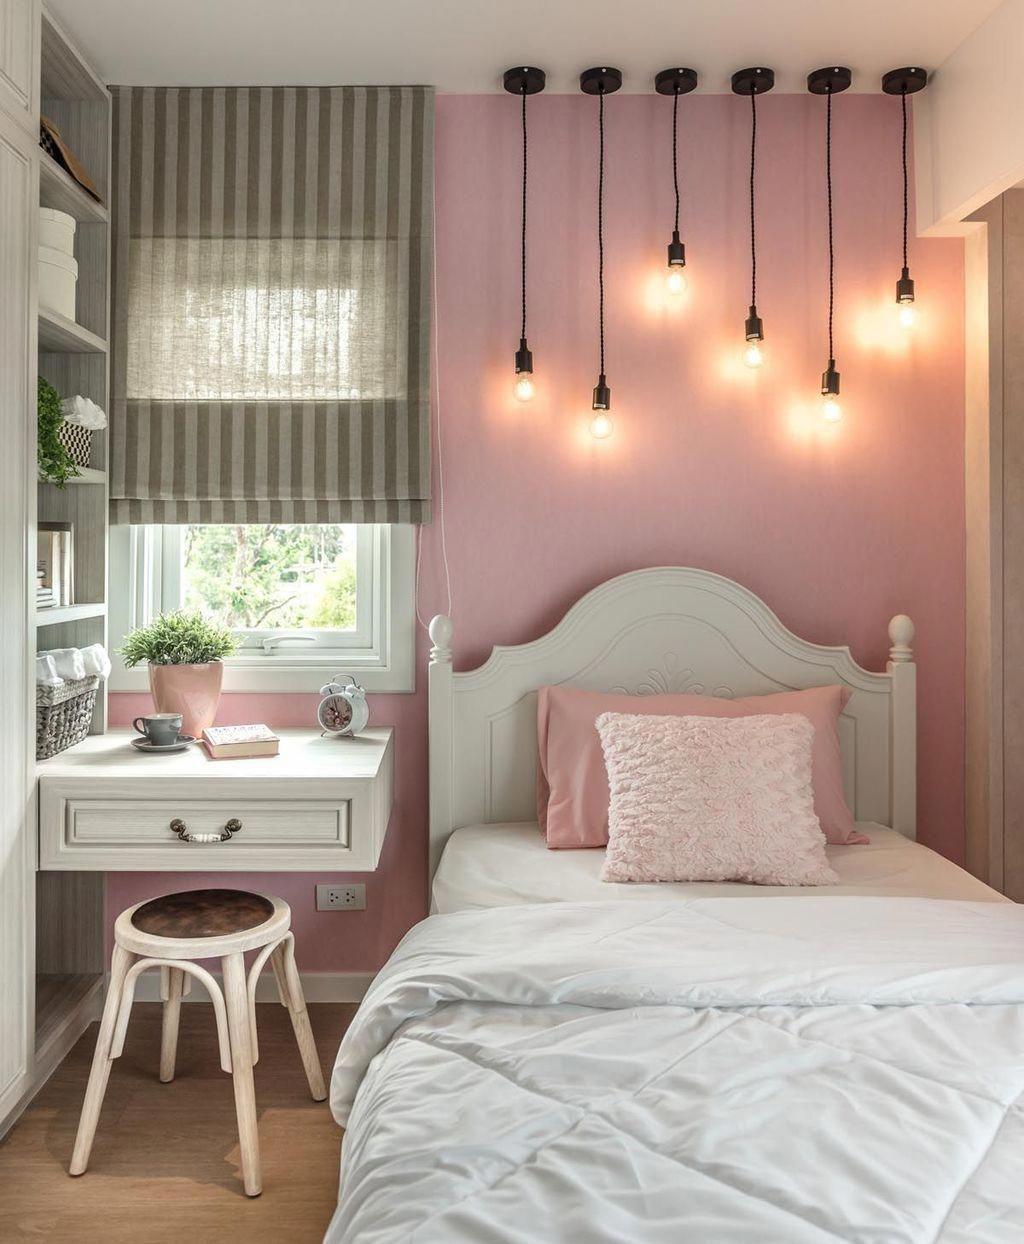 30 Elegant Decorating Ideas For Small Girl Bedrooms Tween ... on Classy Teenage Room Decor  id=13626